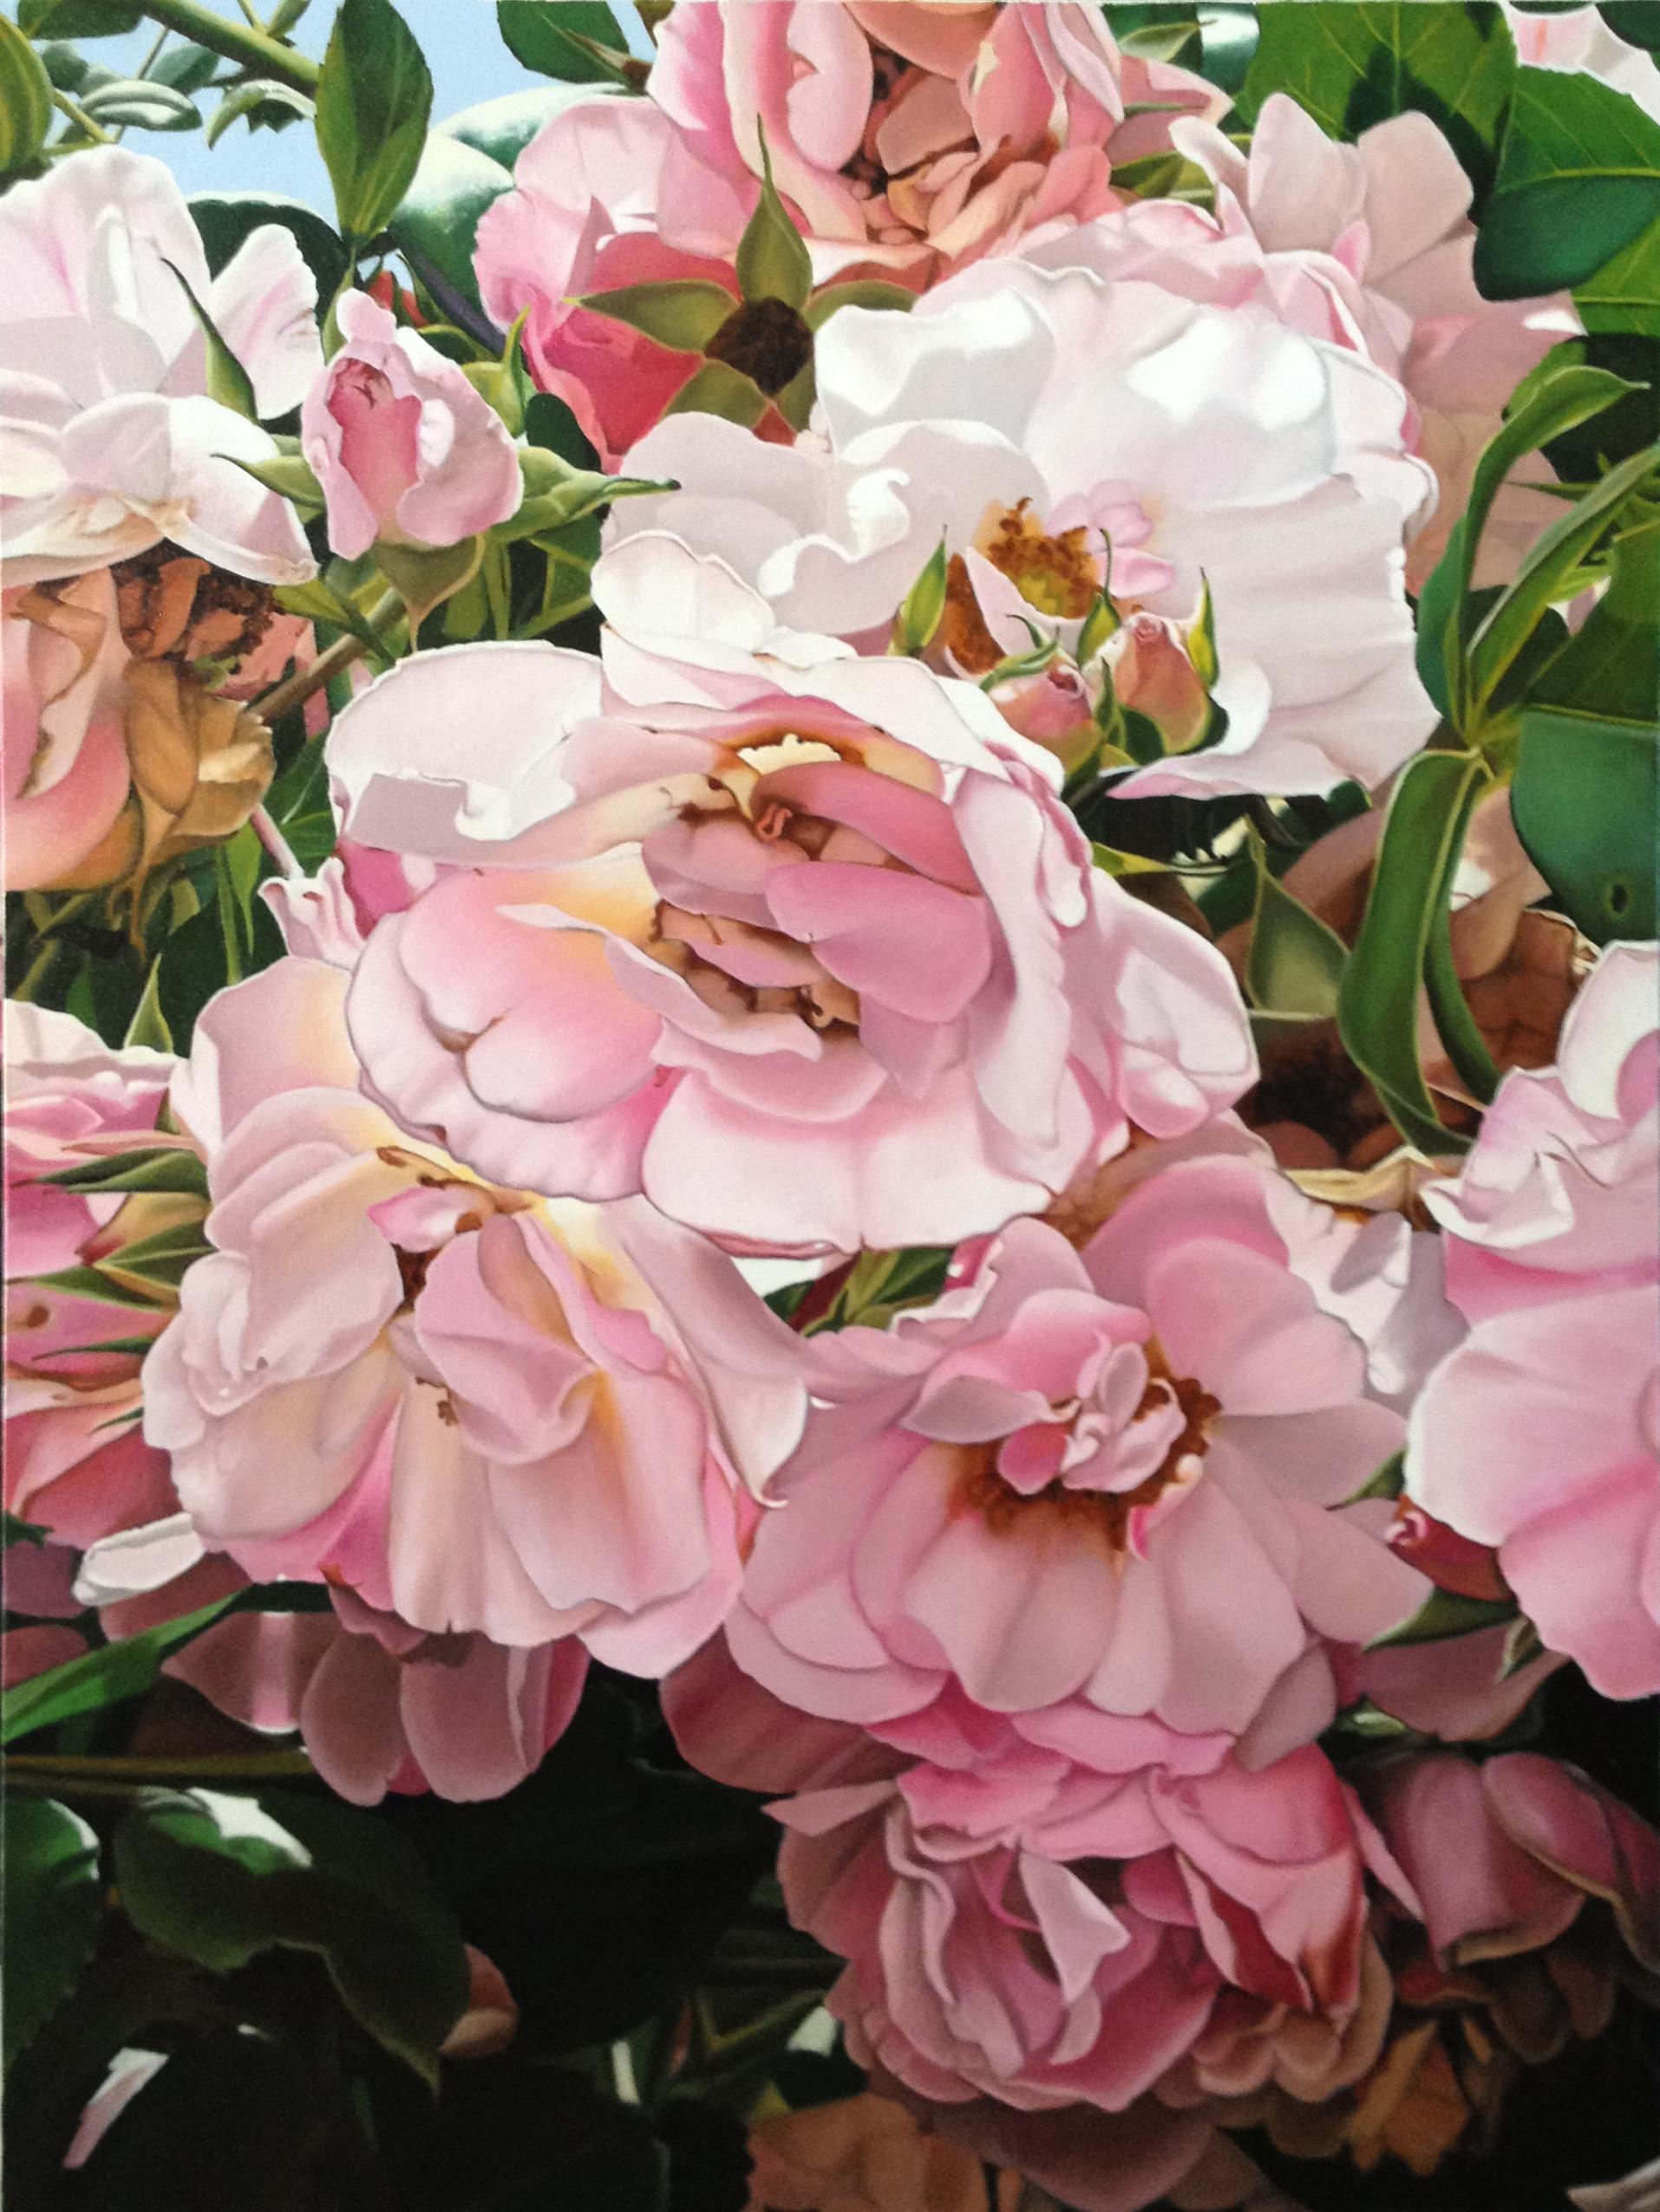 rose abundance part 1